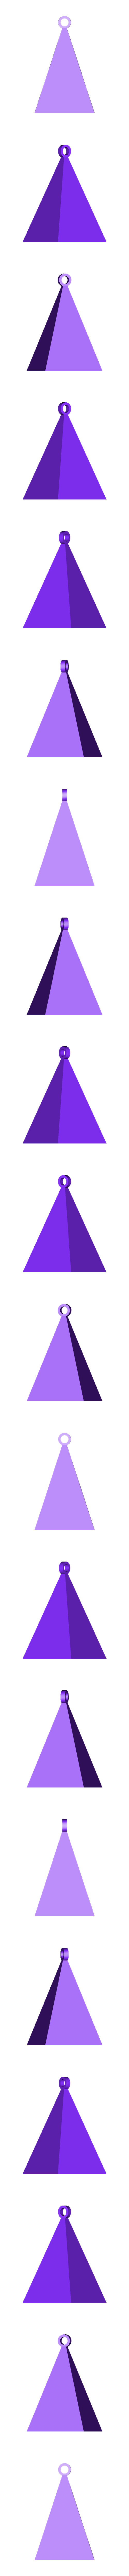 piramide.STL Download STL file Fantasy Earrings 1 • 3D printer design, conagrr